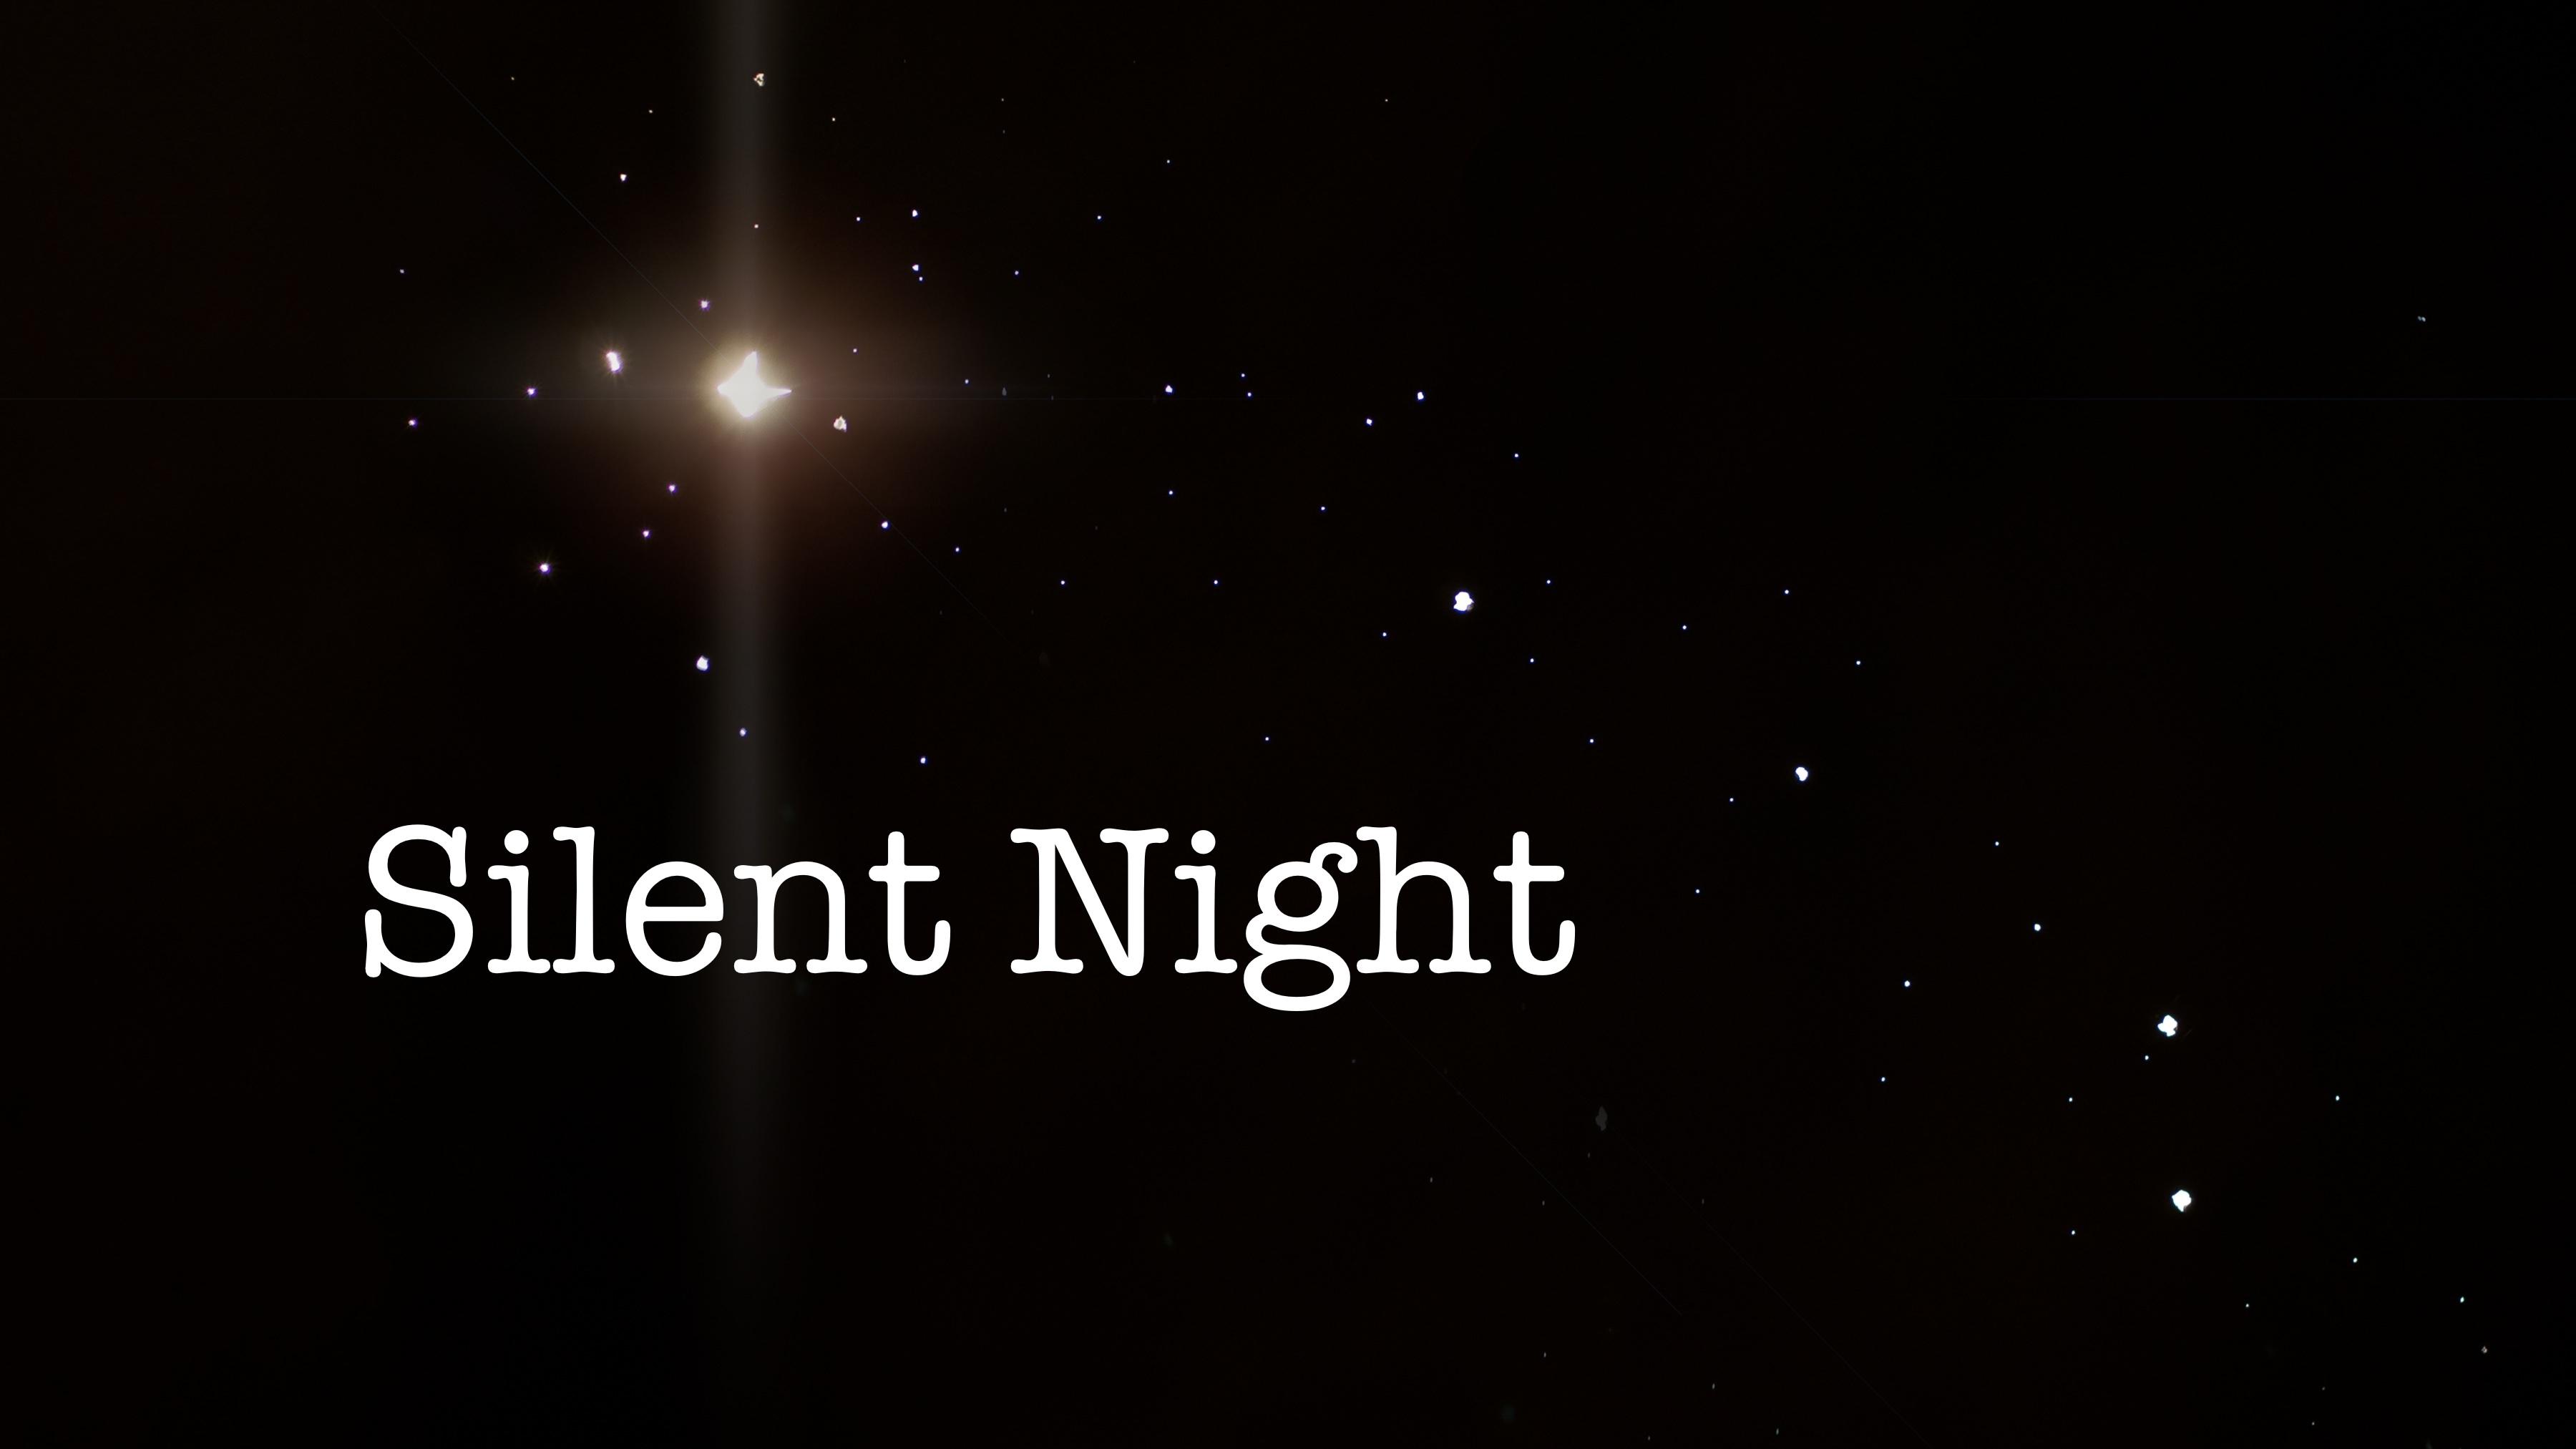 silent night的圖片搜尋結果